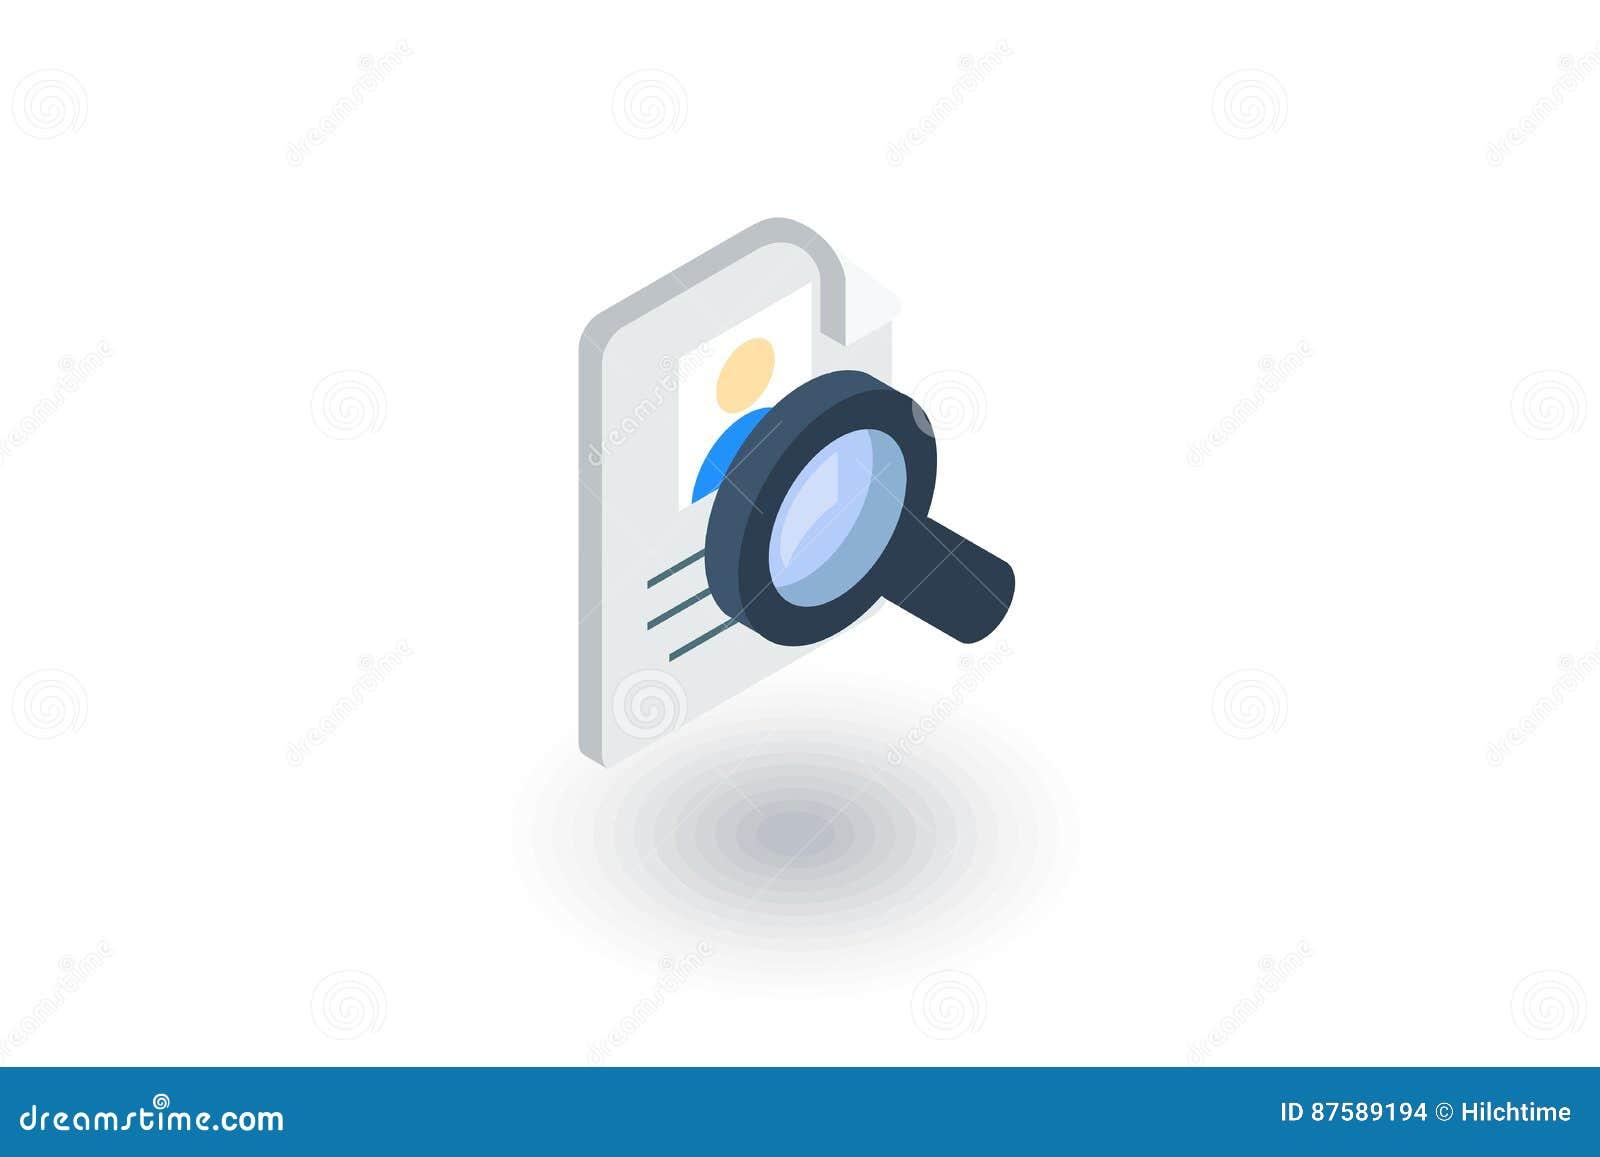 Recruitment, Resume Search, Job, Selecting Staff Isometric